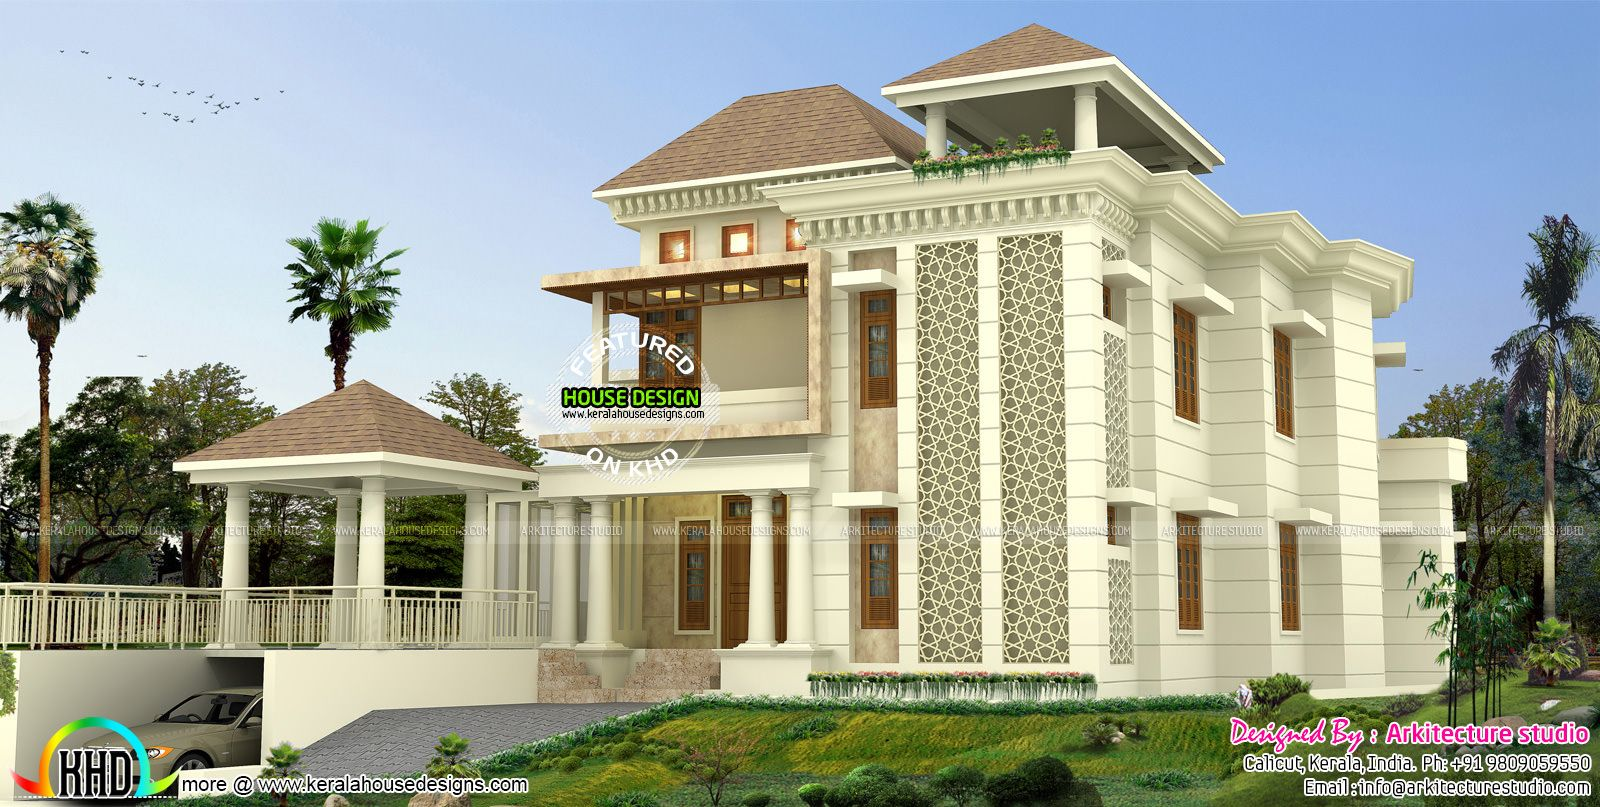 Sq yd modern house architecture kerala home design floor plans bedroom american